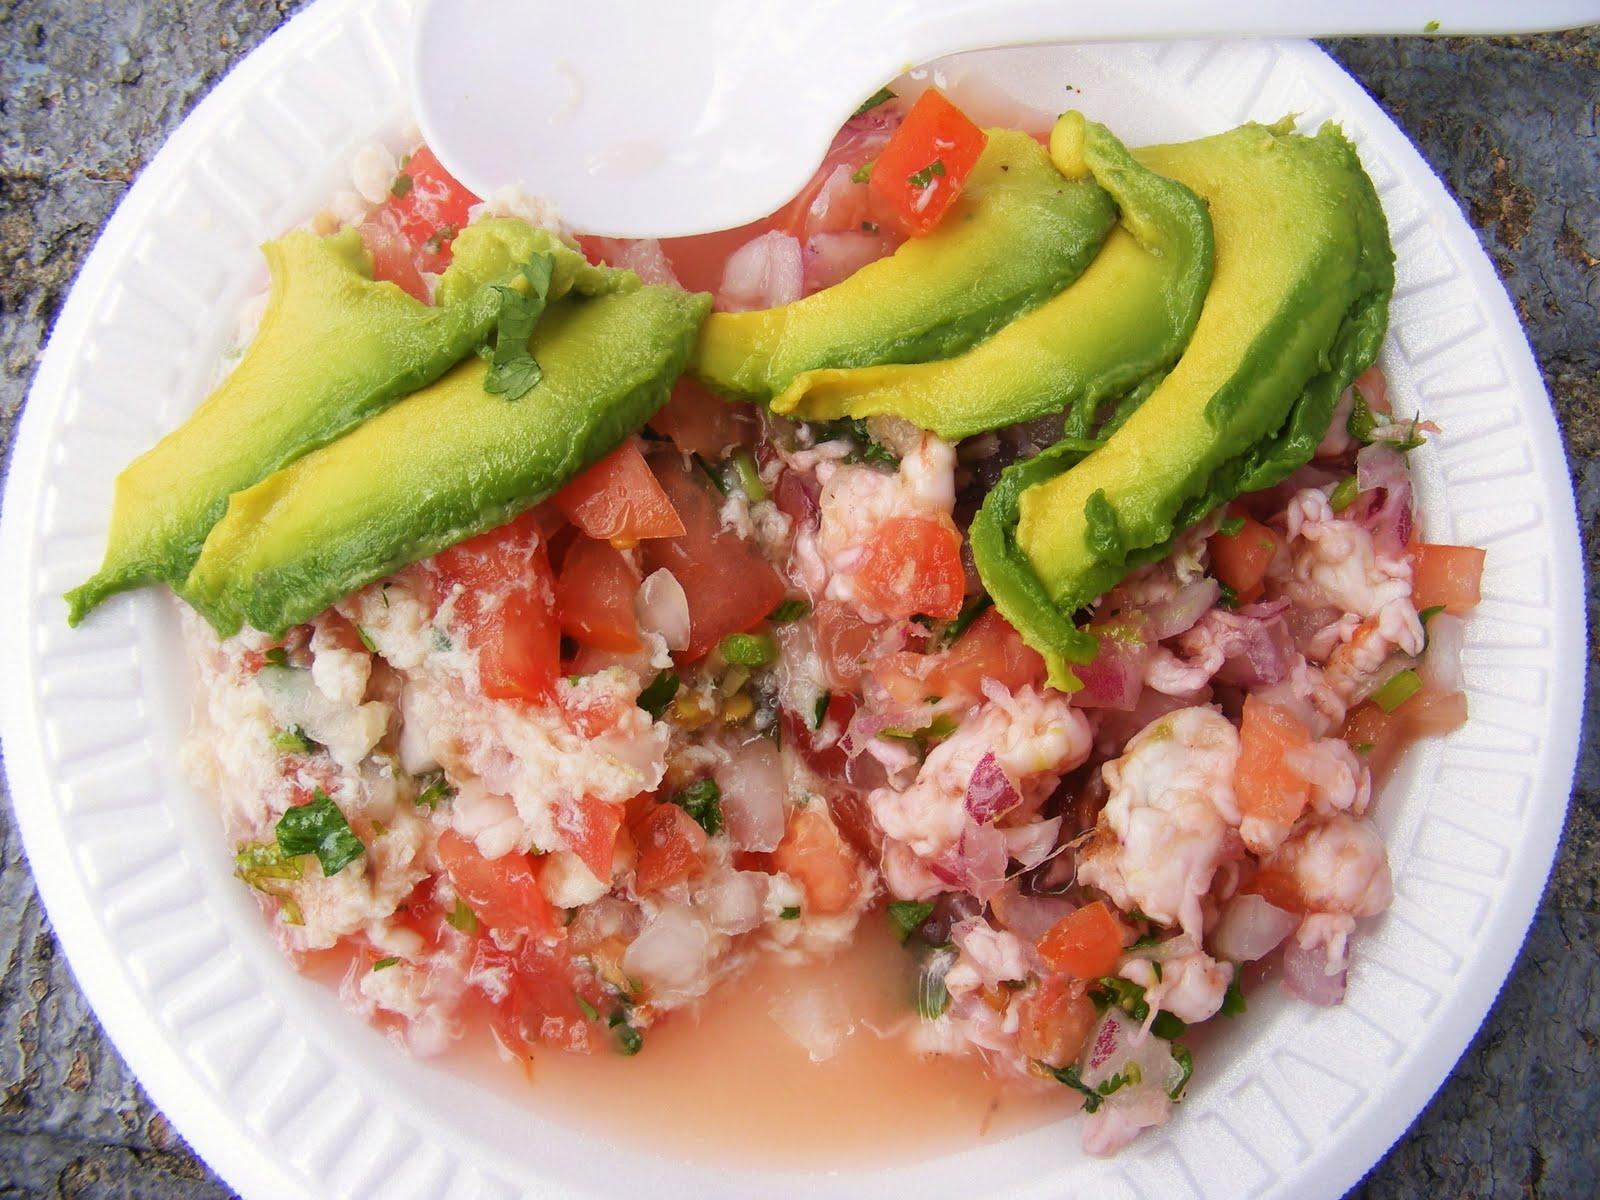 Ceviche de camaron(shrimp ceviche)